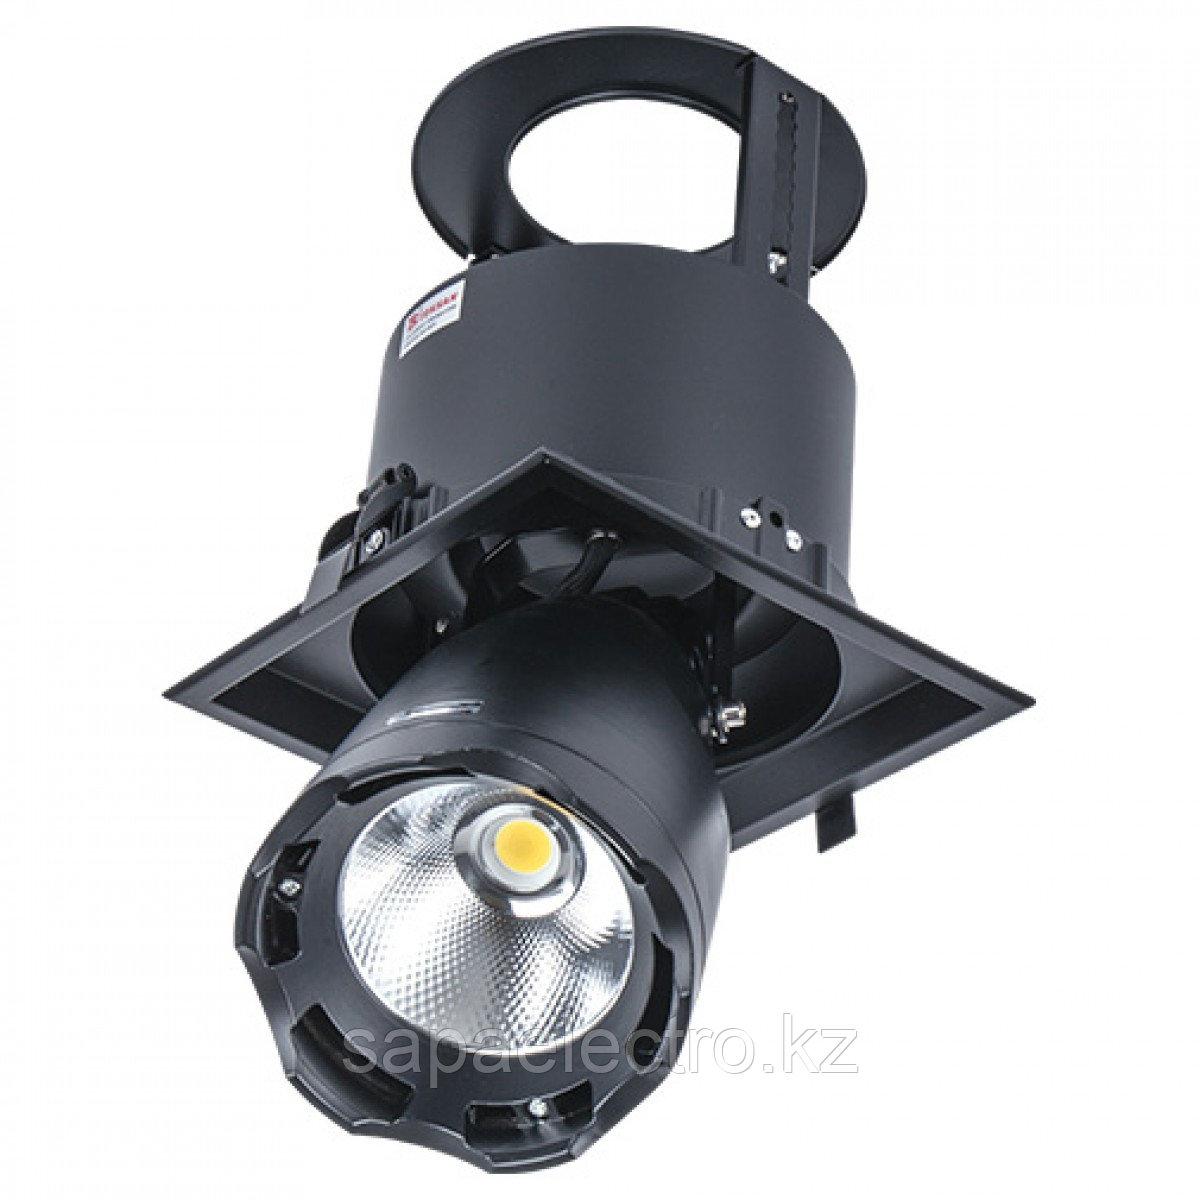 Св-к DOWNLIGHT LED LS-DK912-1 40W 5700K BLACK(TS)8